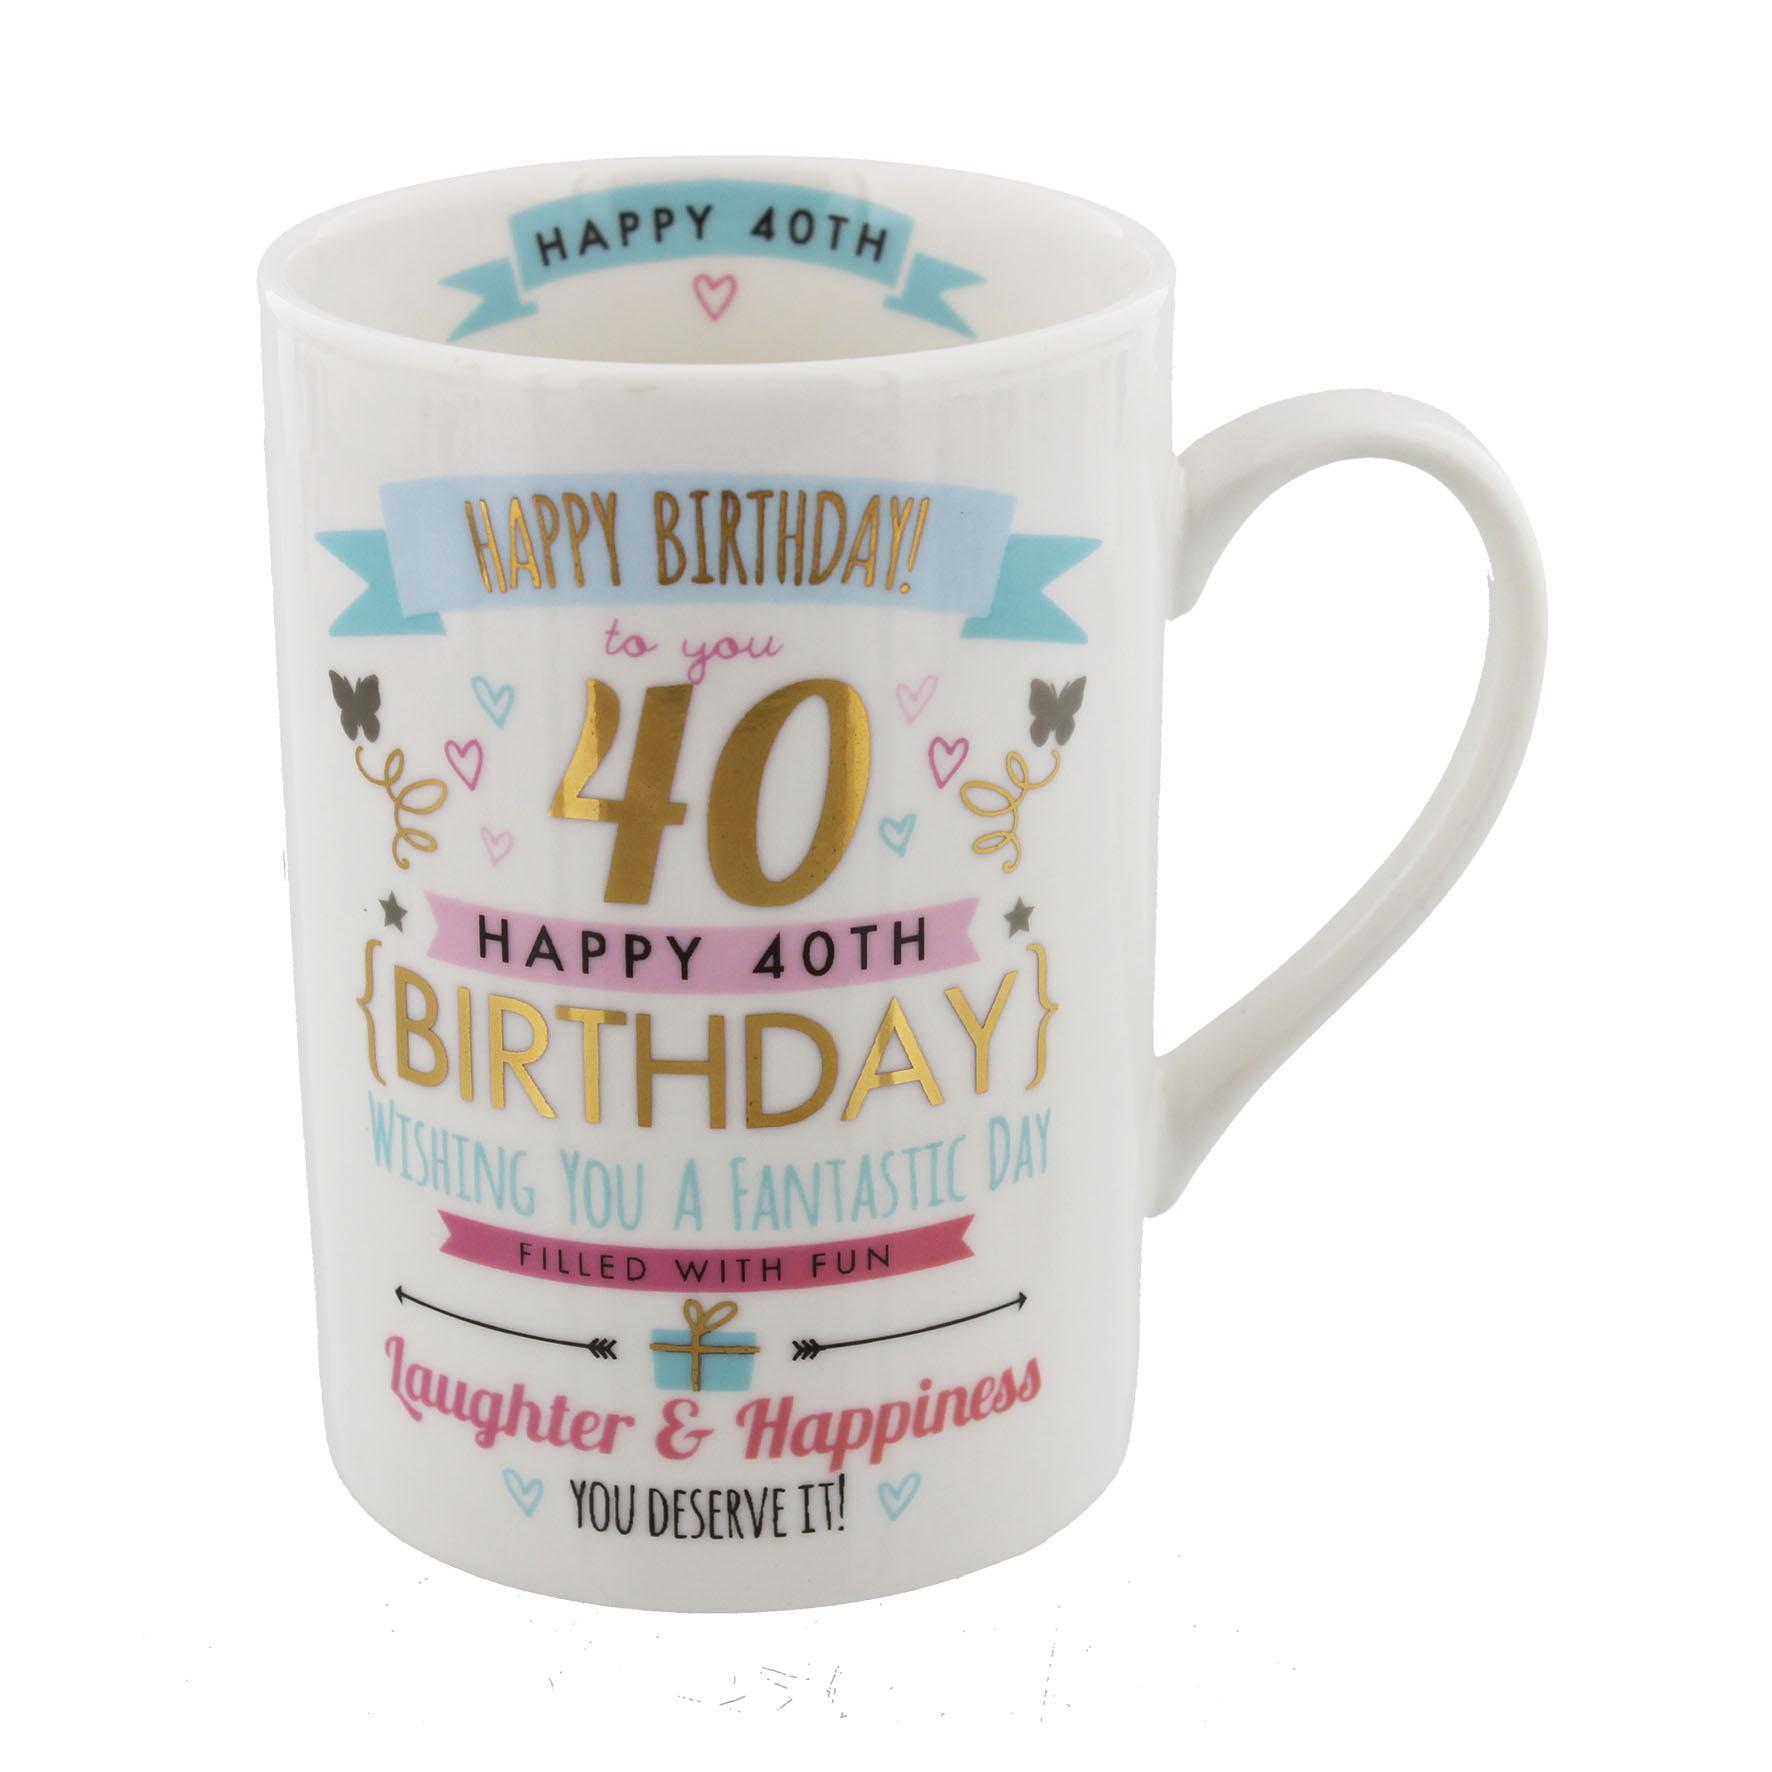 40TH BIRTHDAY MUG PINKu0026GOLD